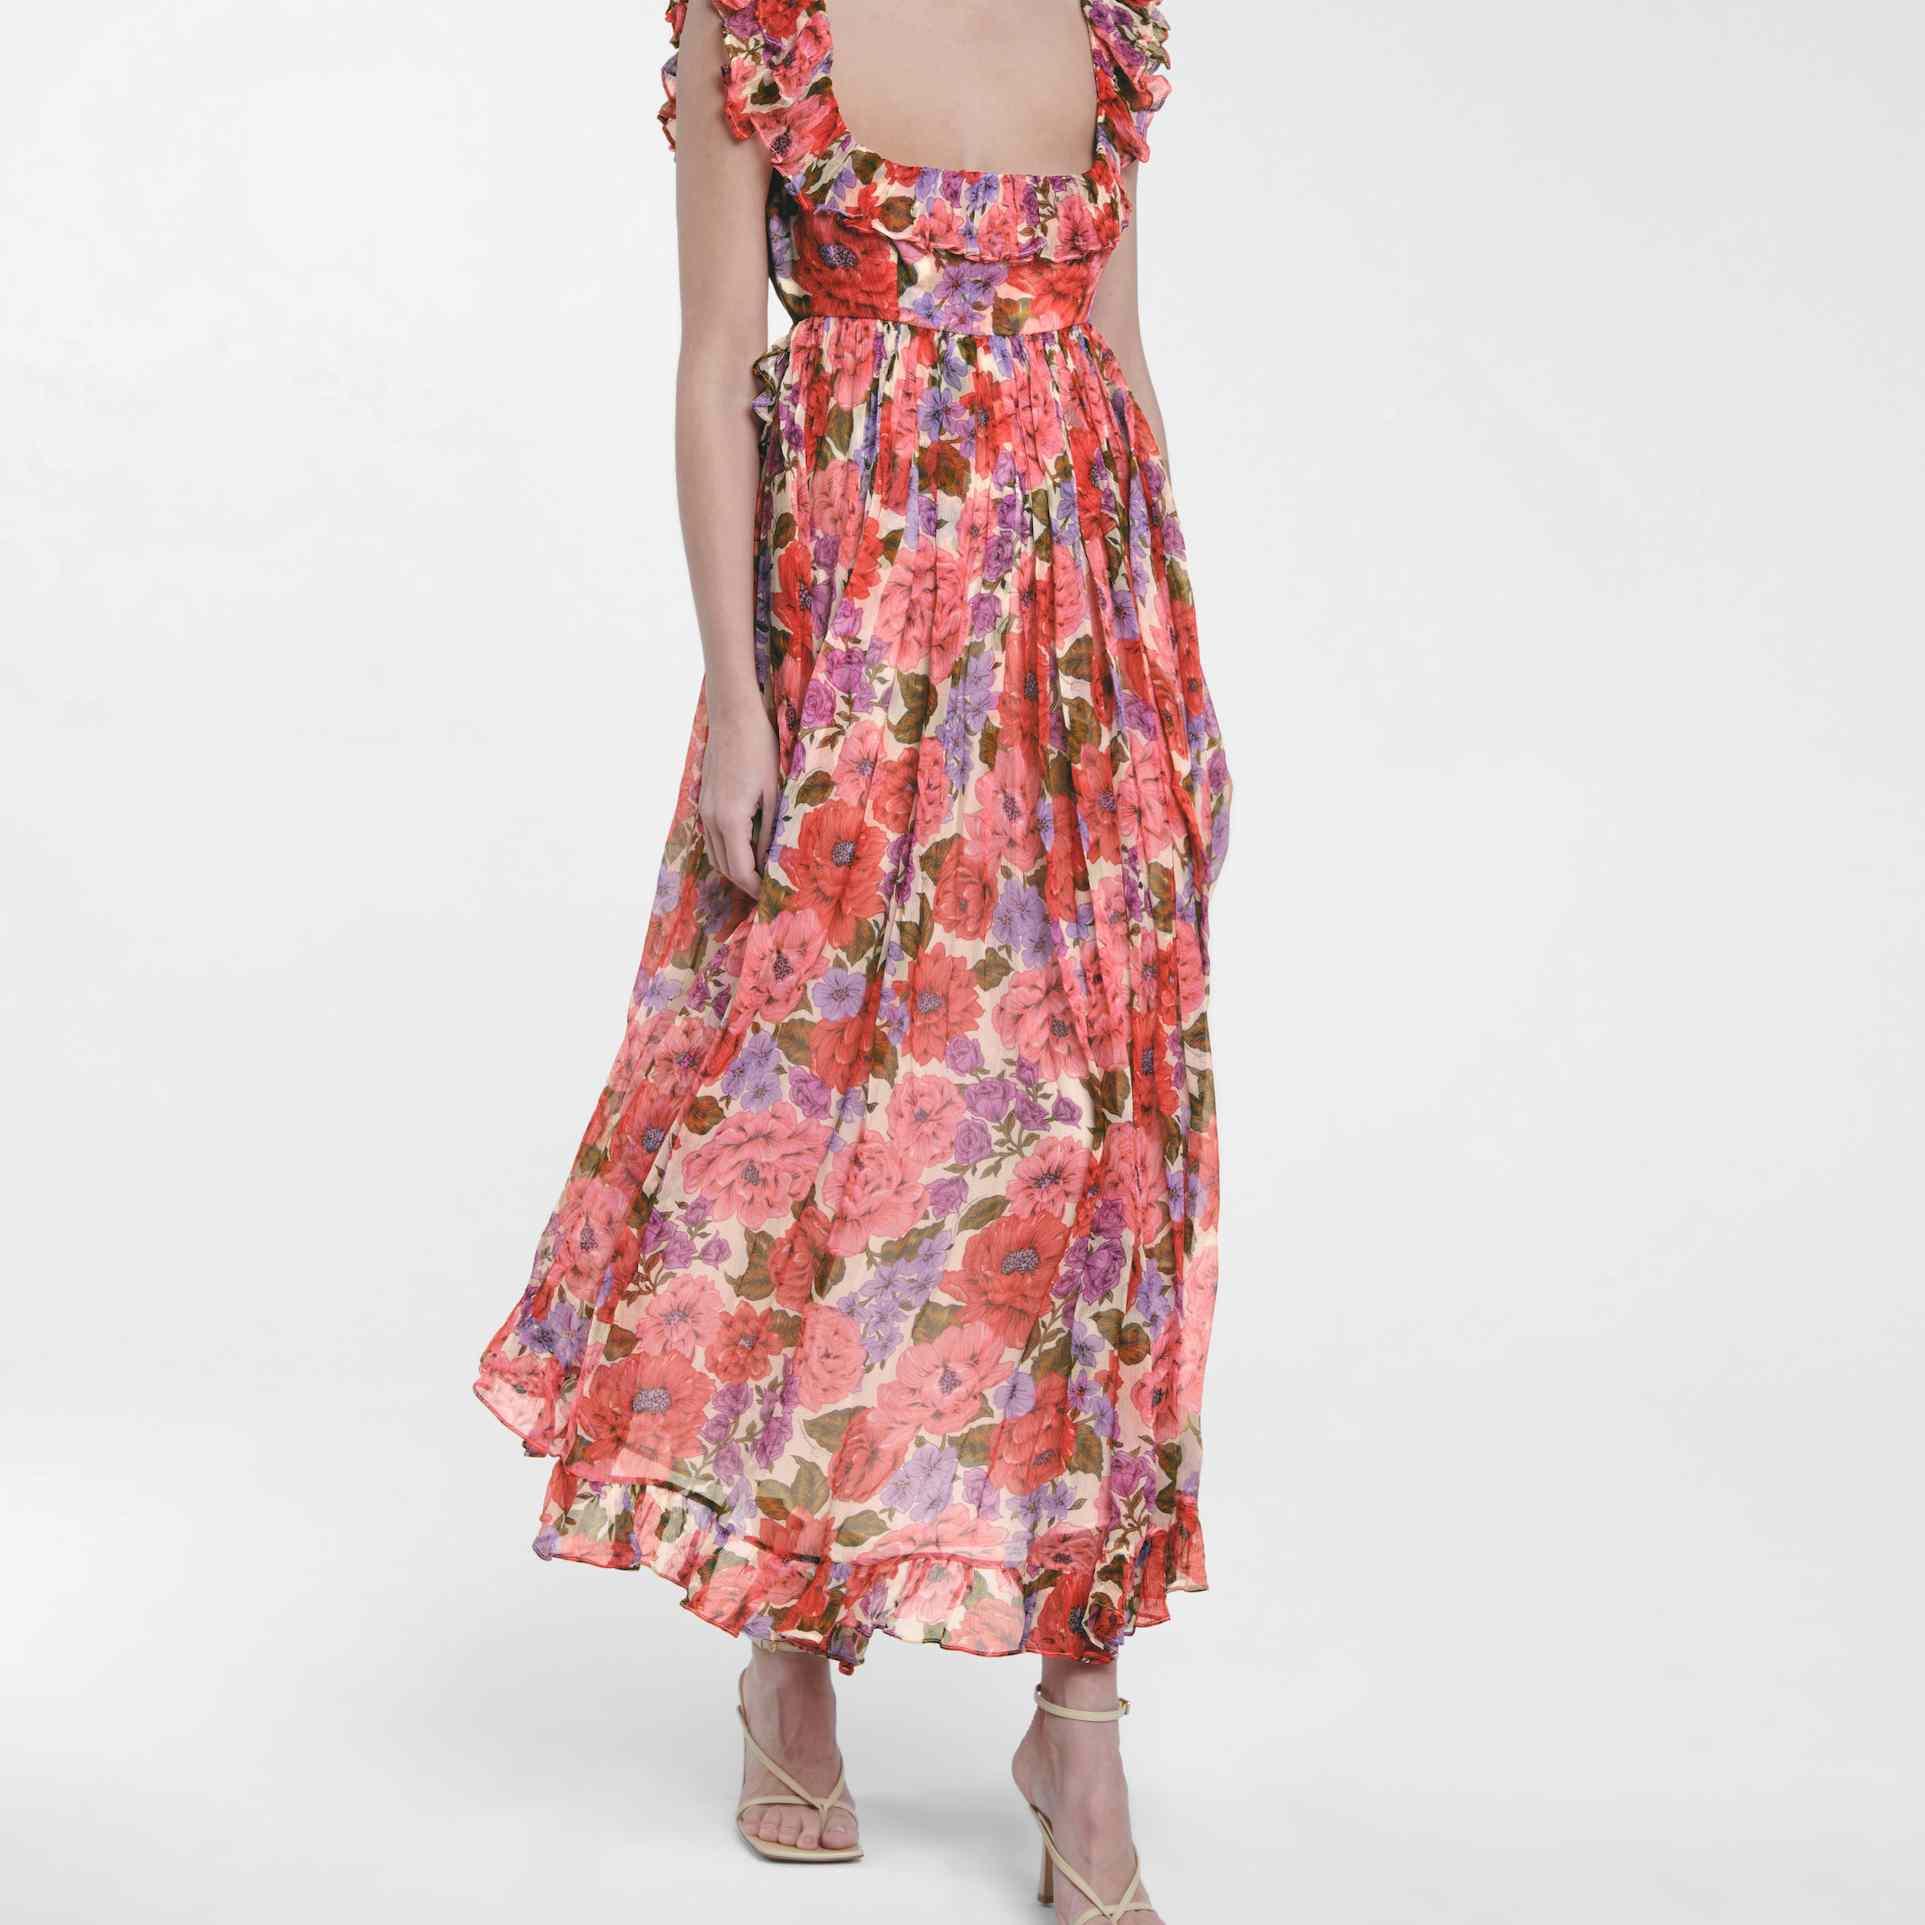 Zimmermann Poppy Floral Silk Midi Dress, $1,150